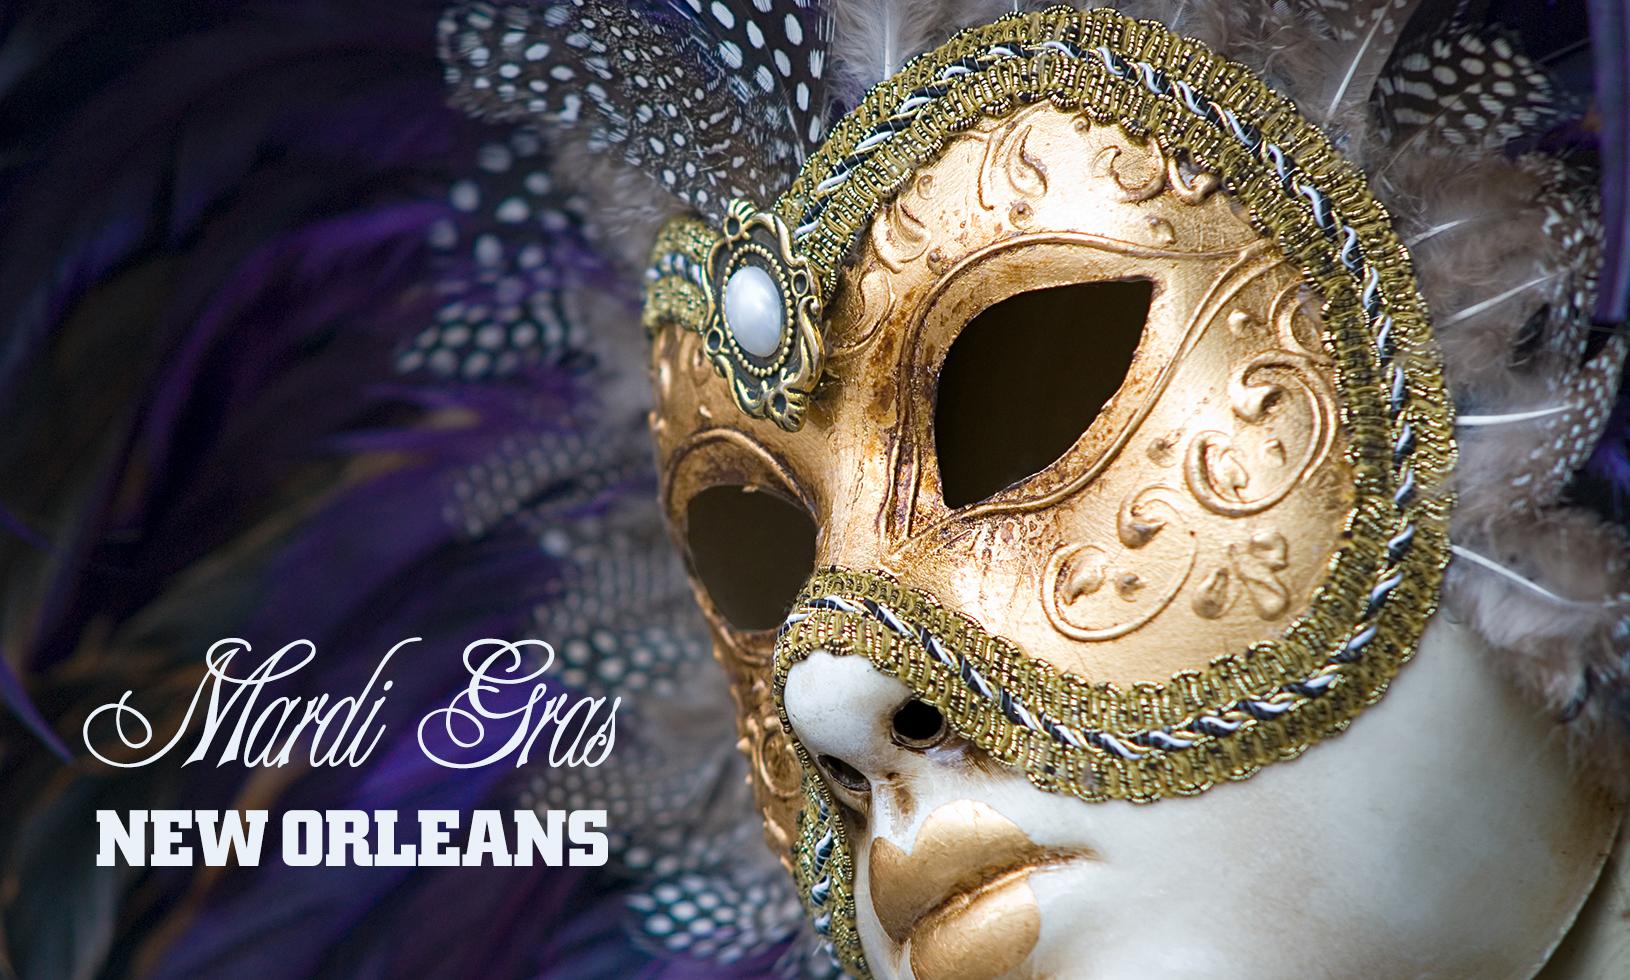 wallpaper Mardi Gras New Orleans hd wallpaper background desktop 1630x980